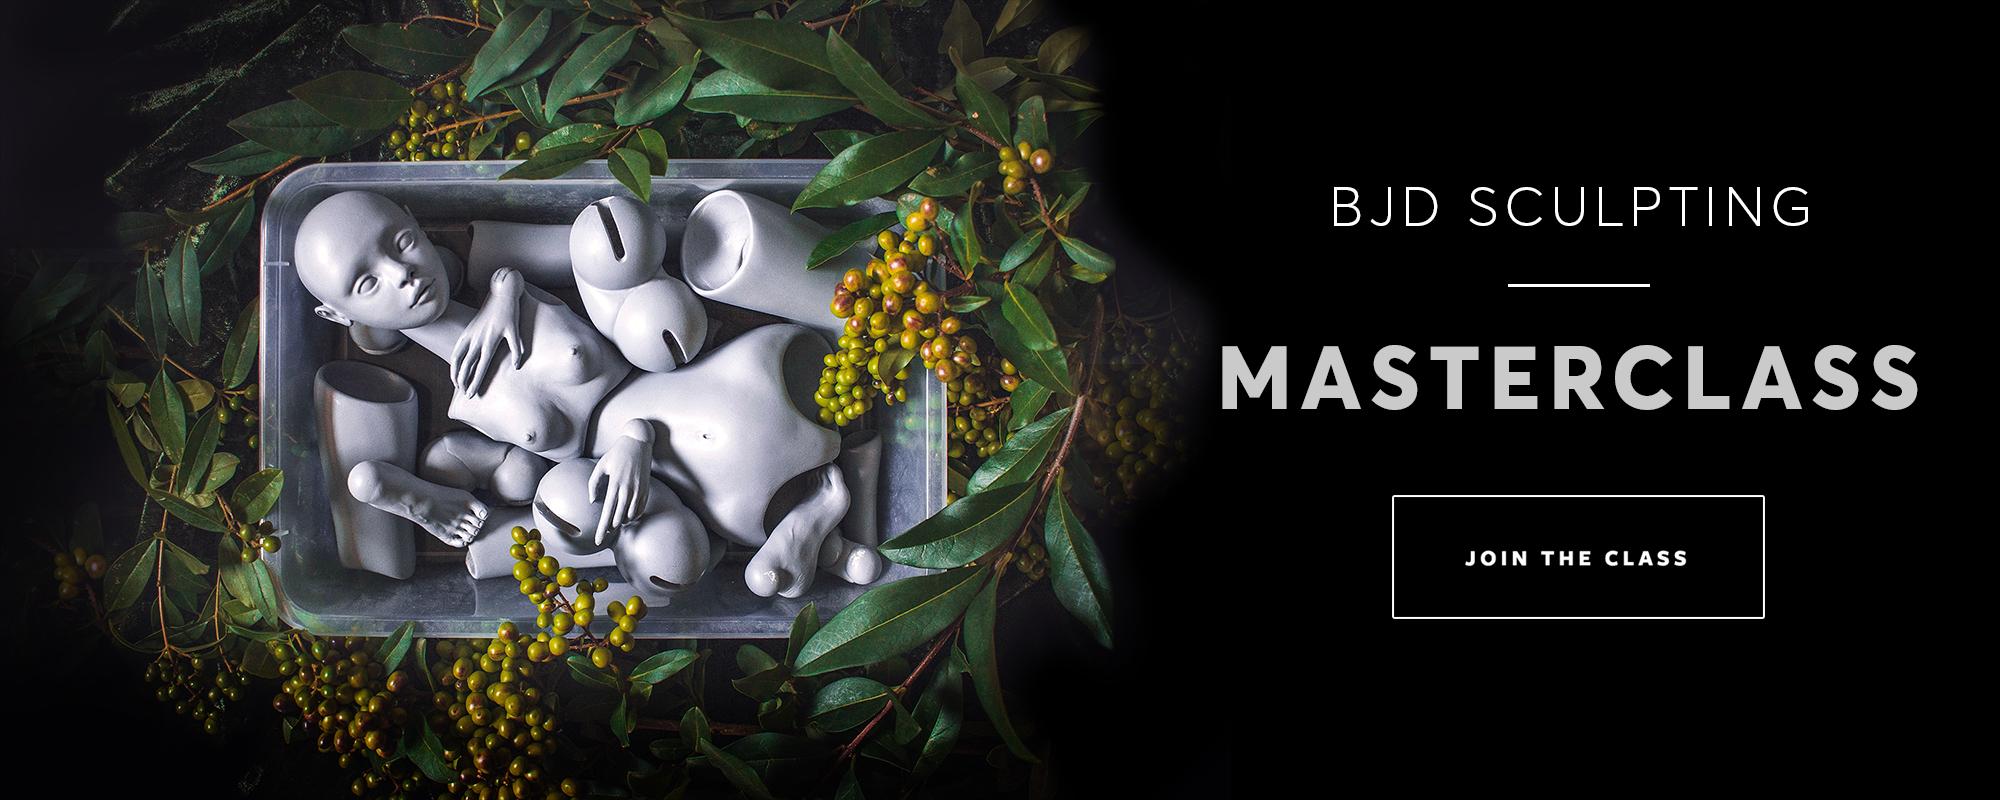 BJD sculpting masterclass by Nymphai Dolls